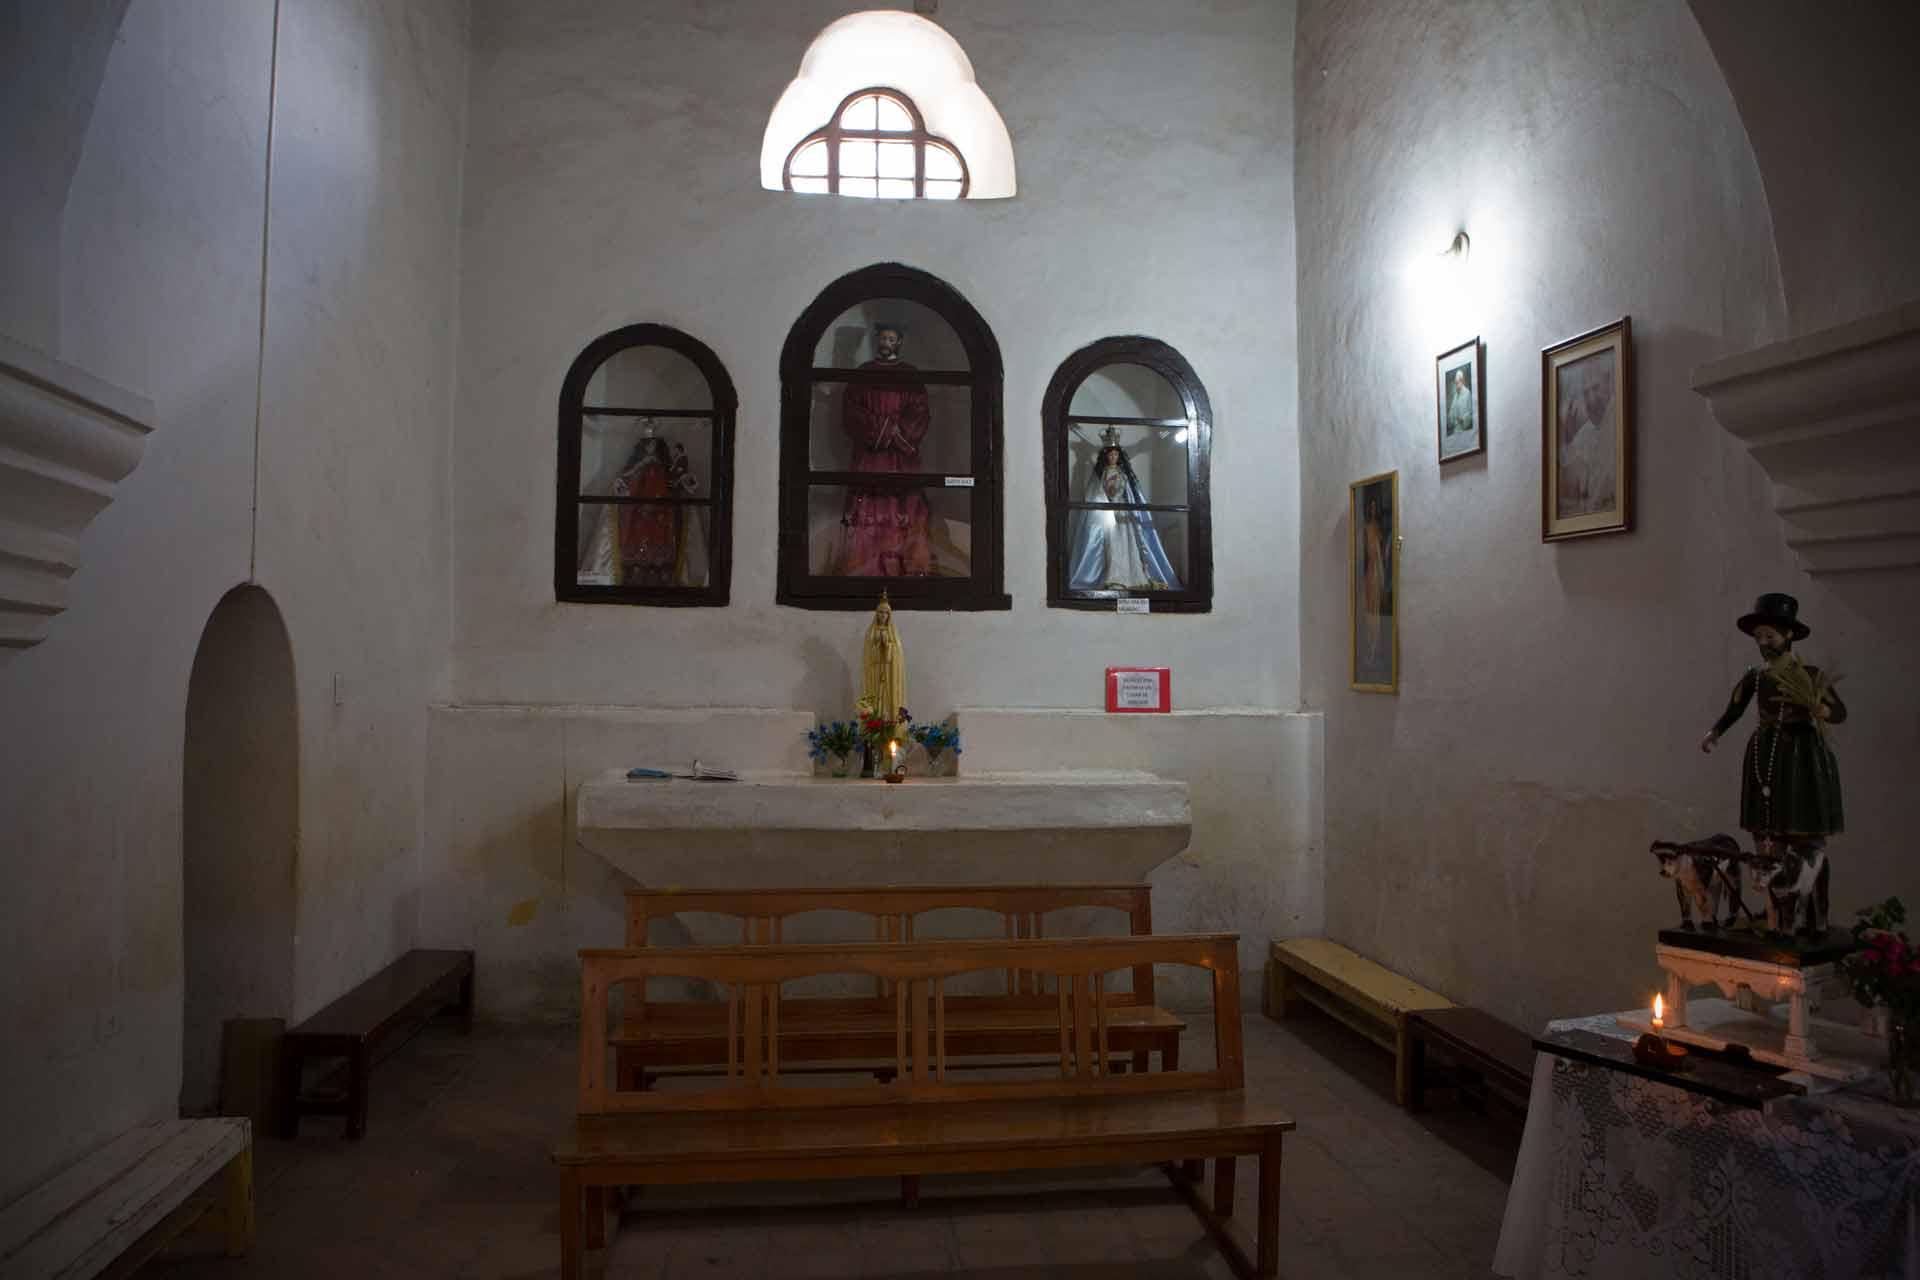 La Iglesia San José de Cachi, Argentina (18th century)